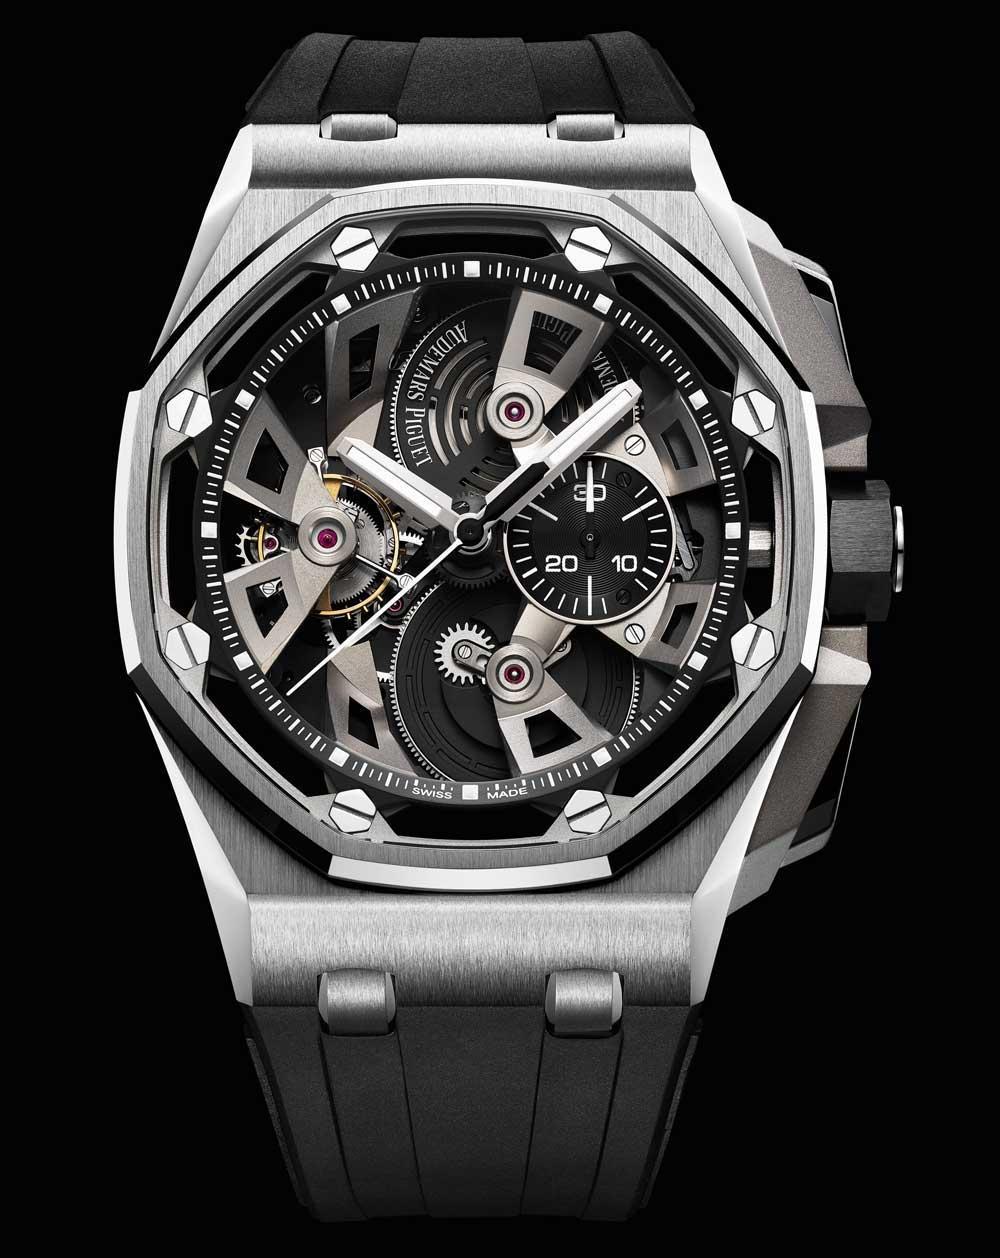 Audemars Piguet Royal Oak Offshore Tourbillon Chronograph 25th Anniversary Watches Watch Releases